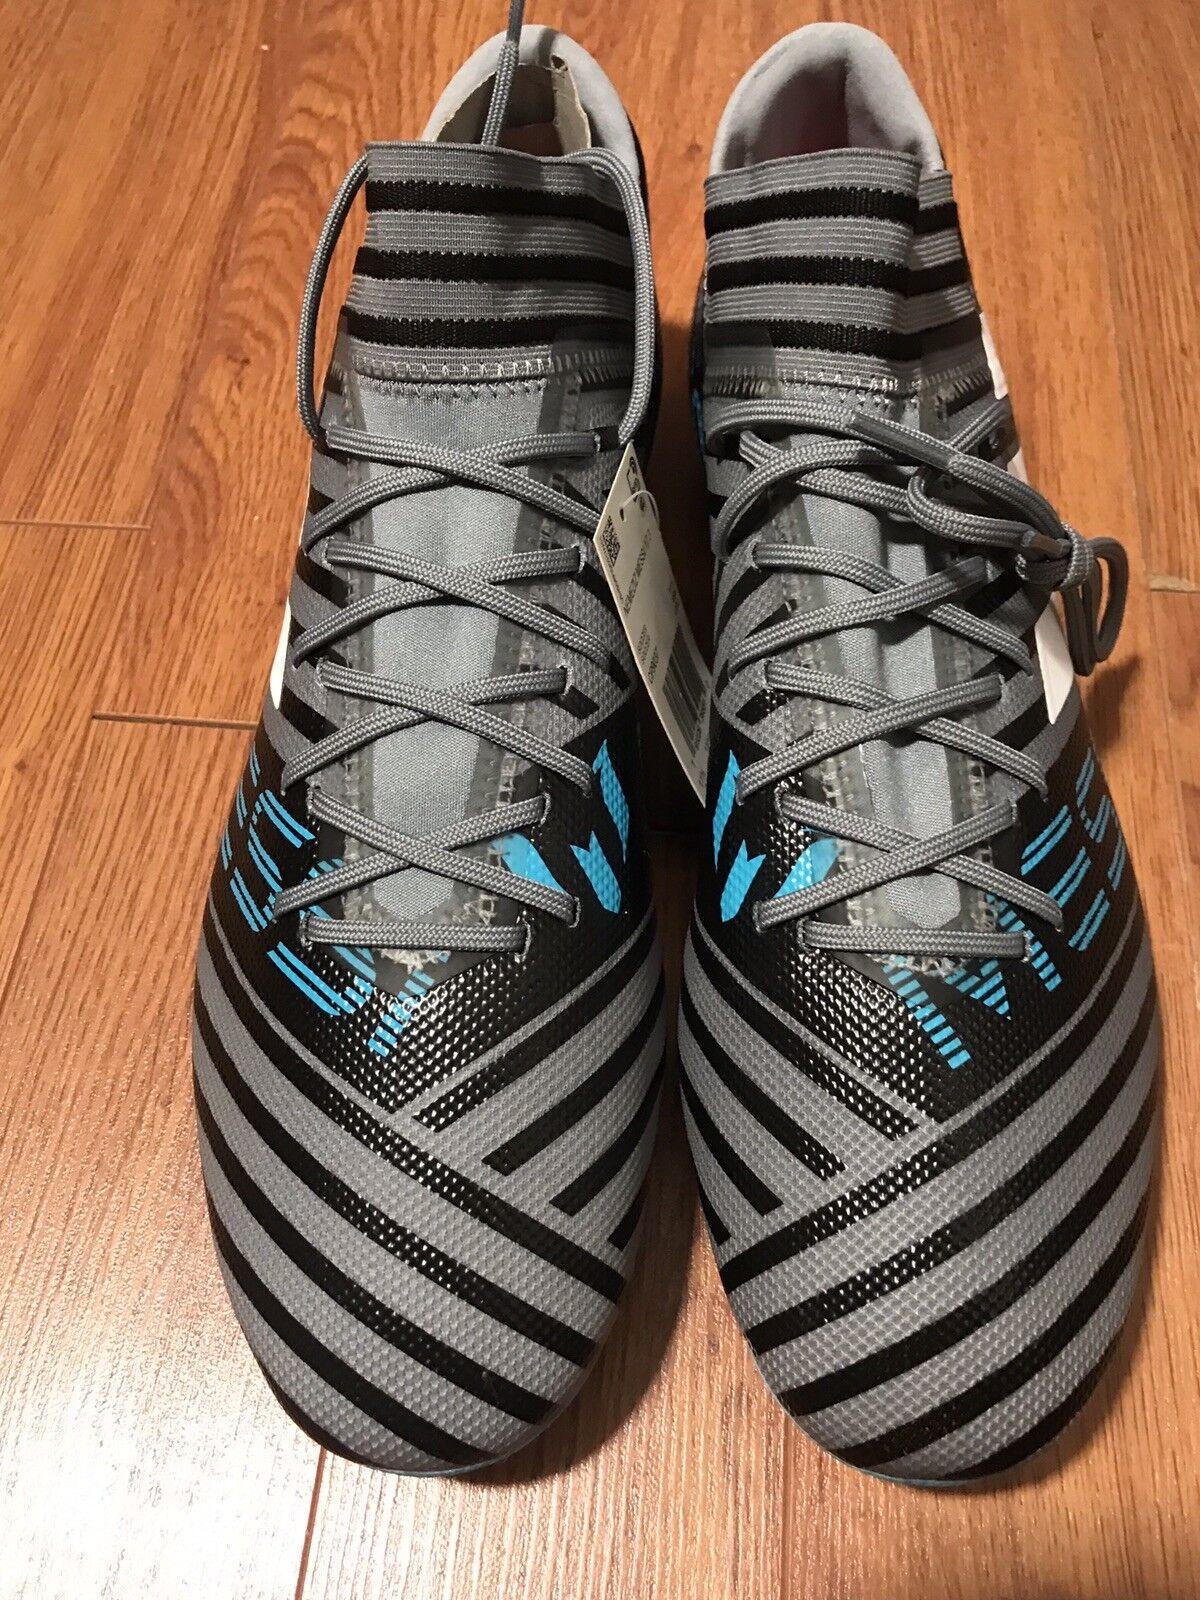 Adidas 17.3 Nemeziz  Messi Mens FG Outdoor Soccer Cleats CP9037 Size 12